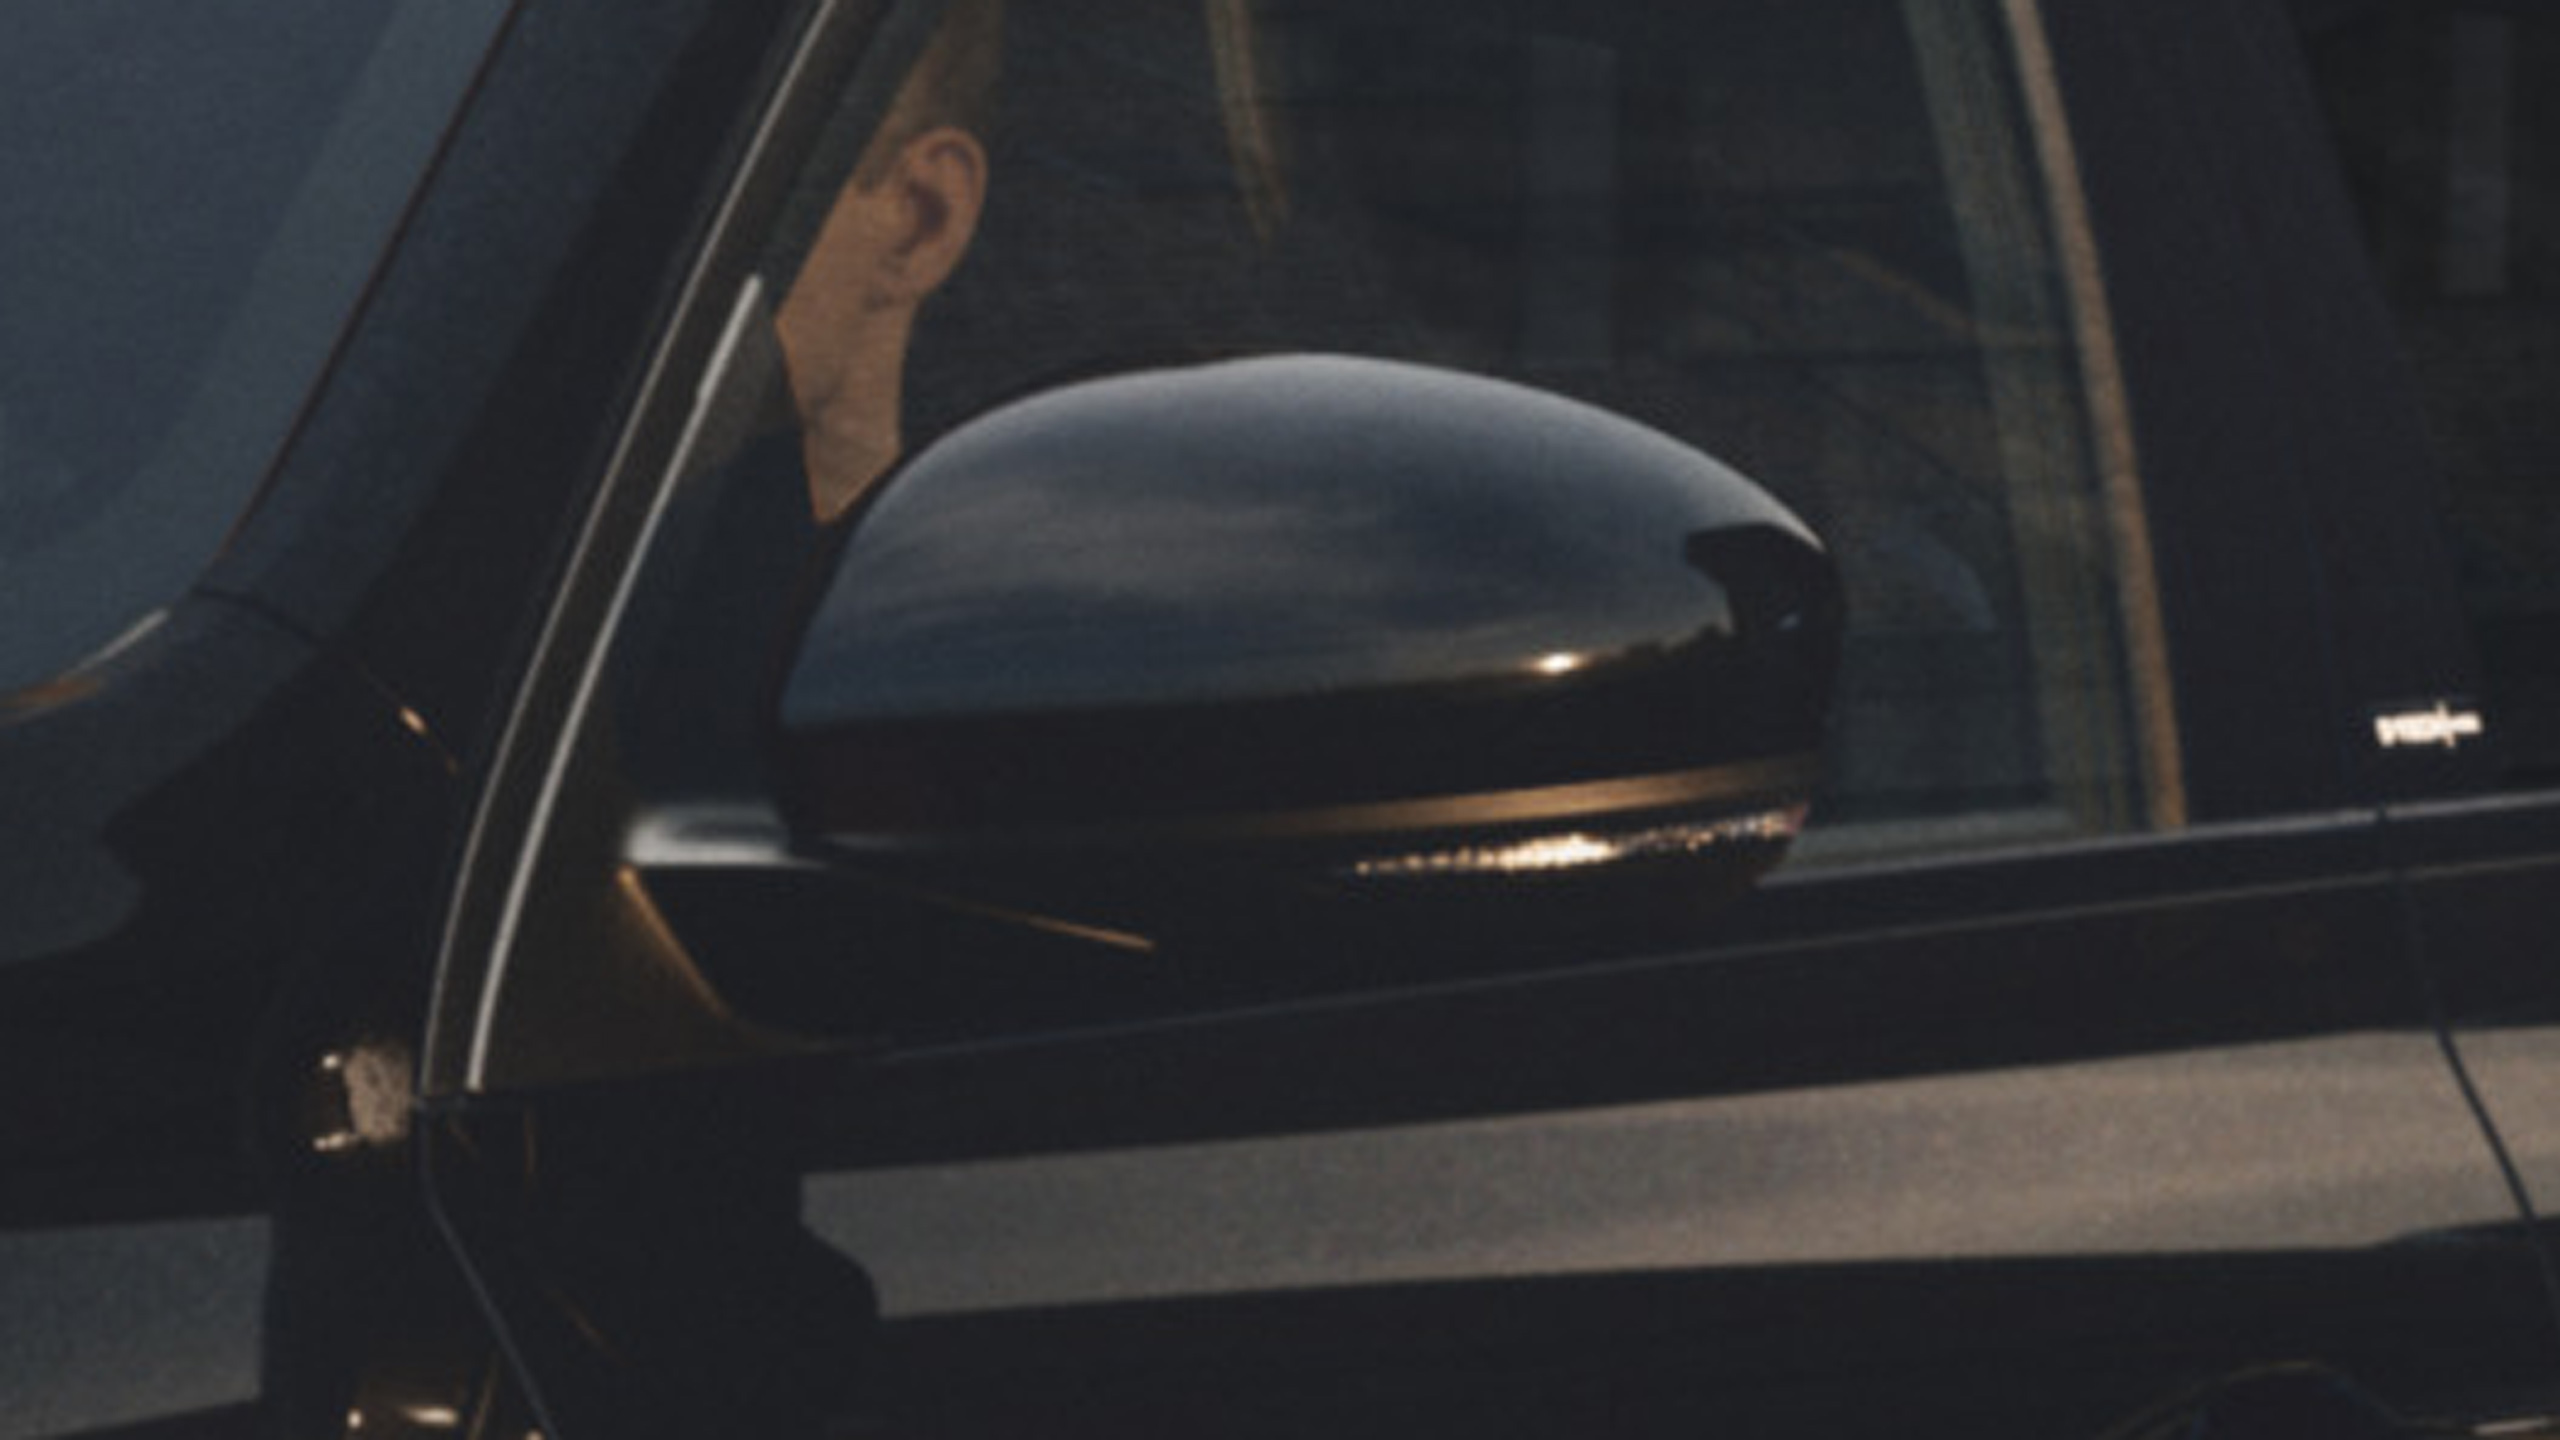 Buitenspiegels in koetswerkkleur